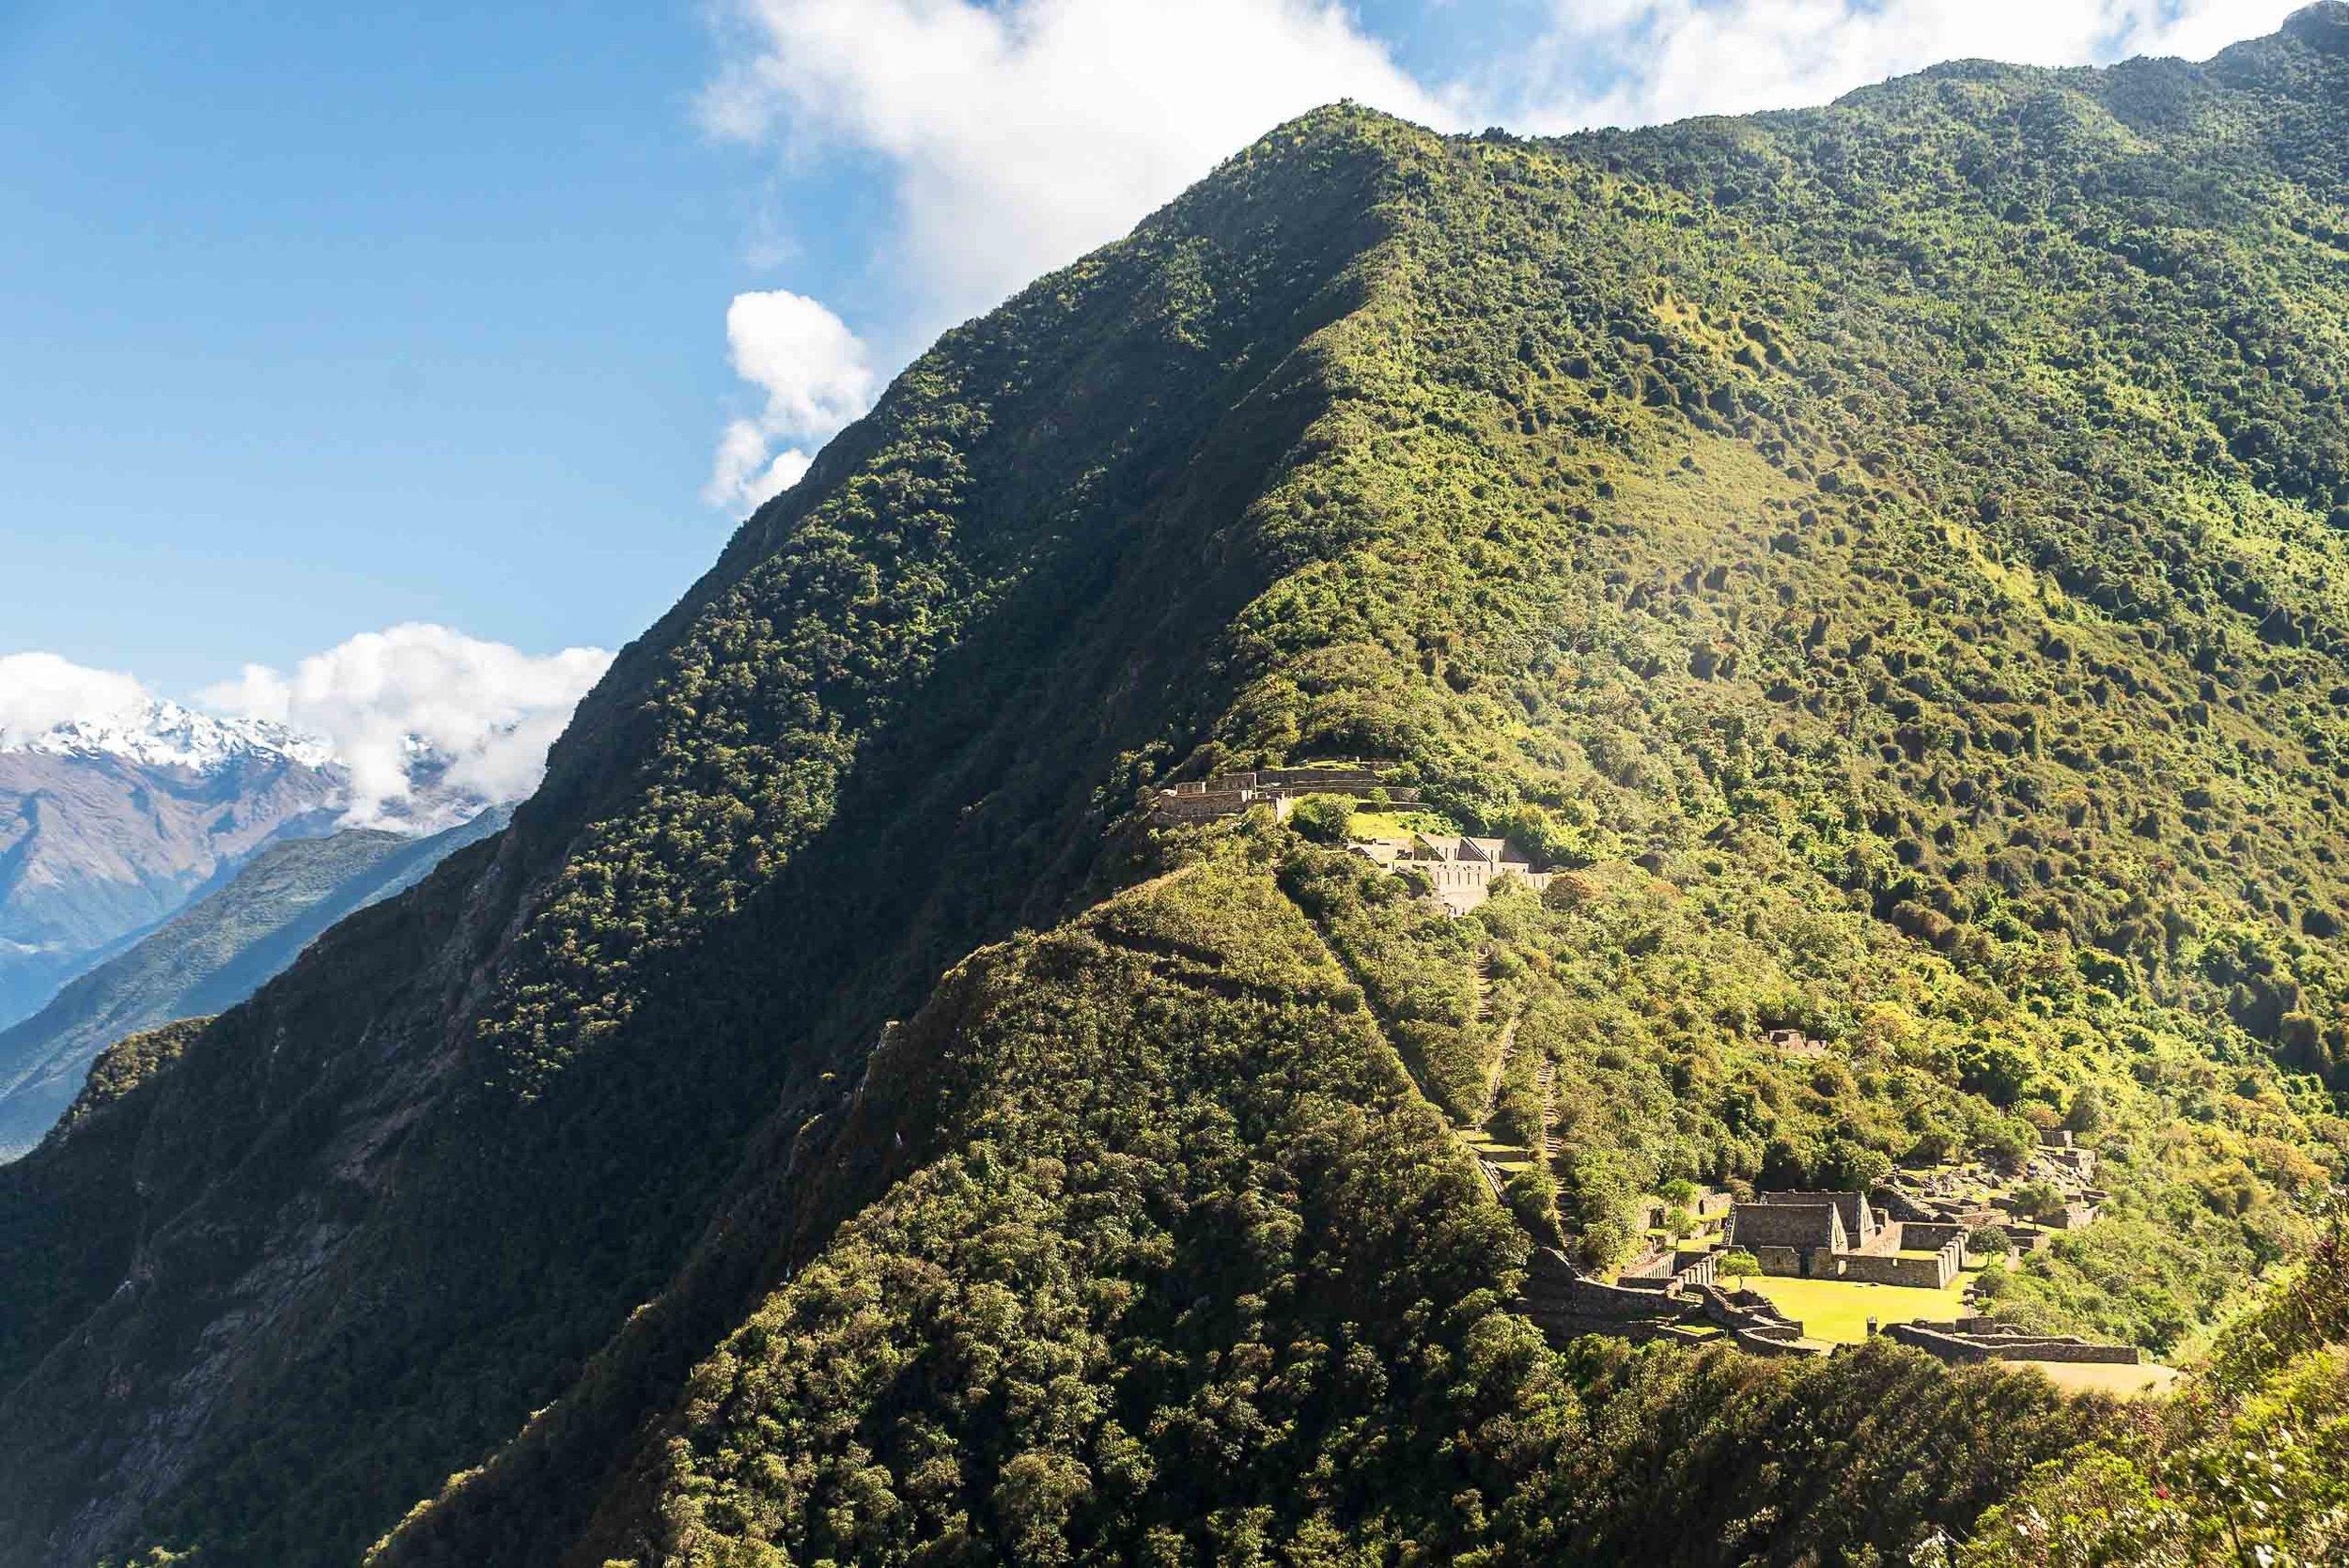 THE BIG PAPA JO - PART 1: CHOQUEQUIRAO